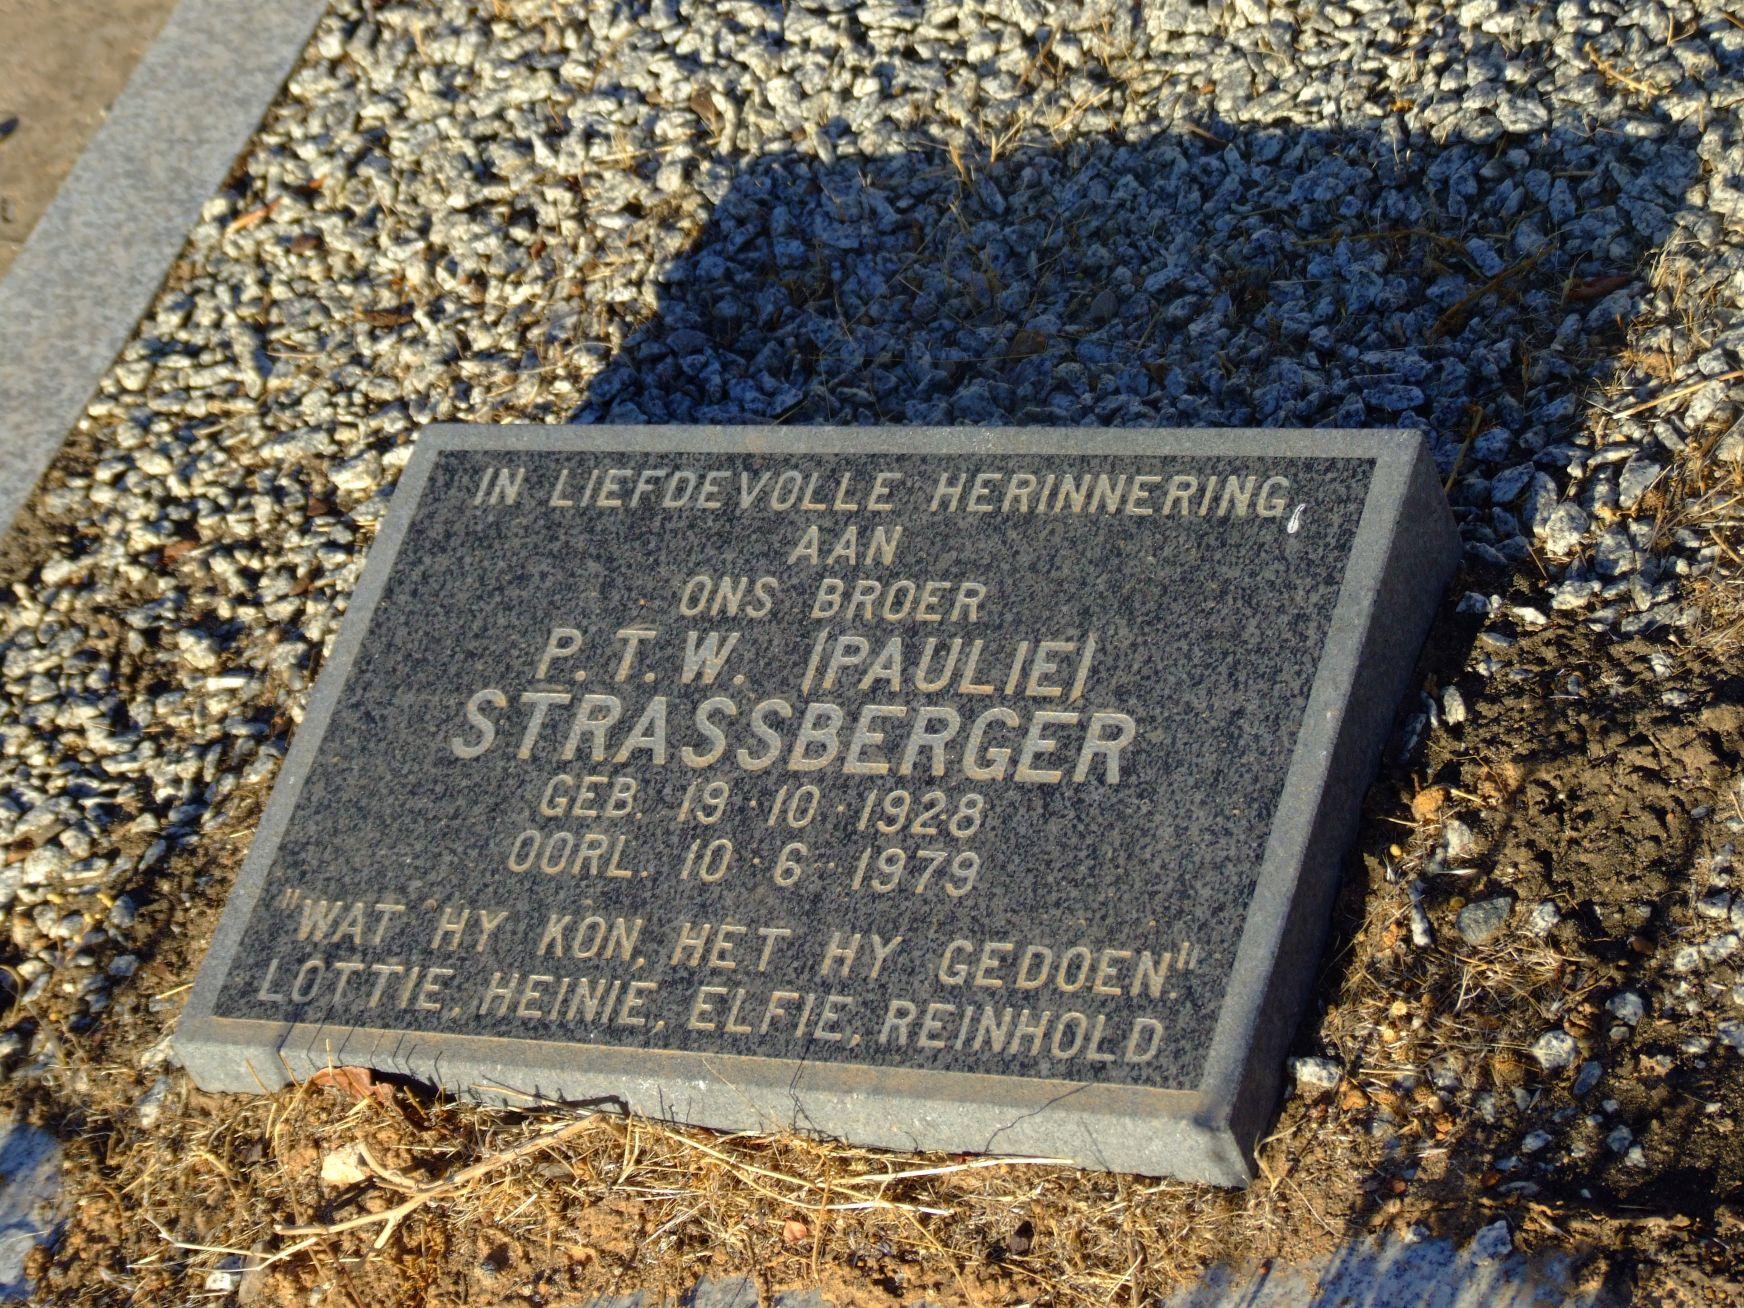 Strassberger, P.T.W. (Paulie)